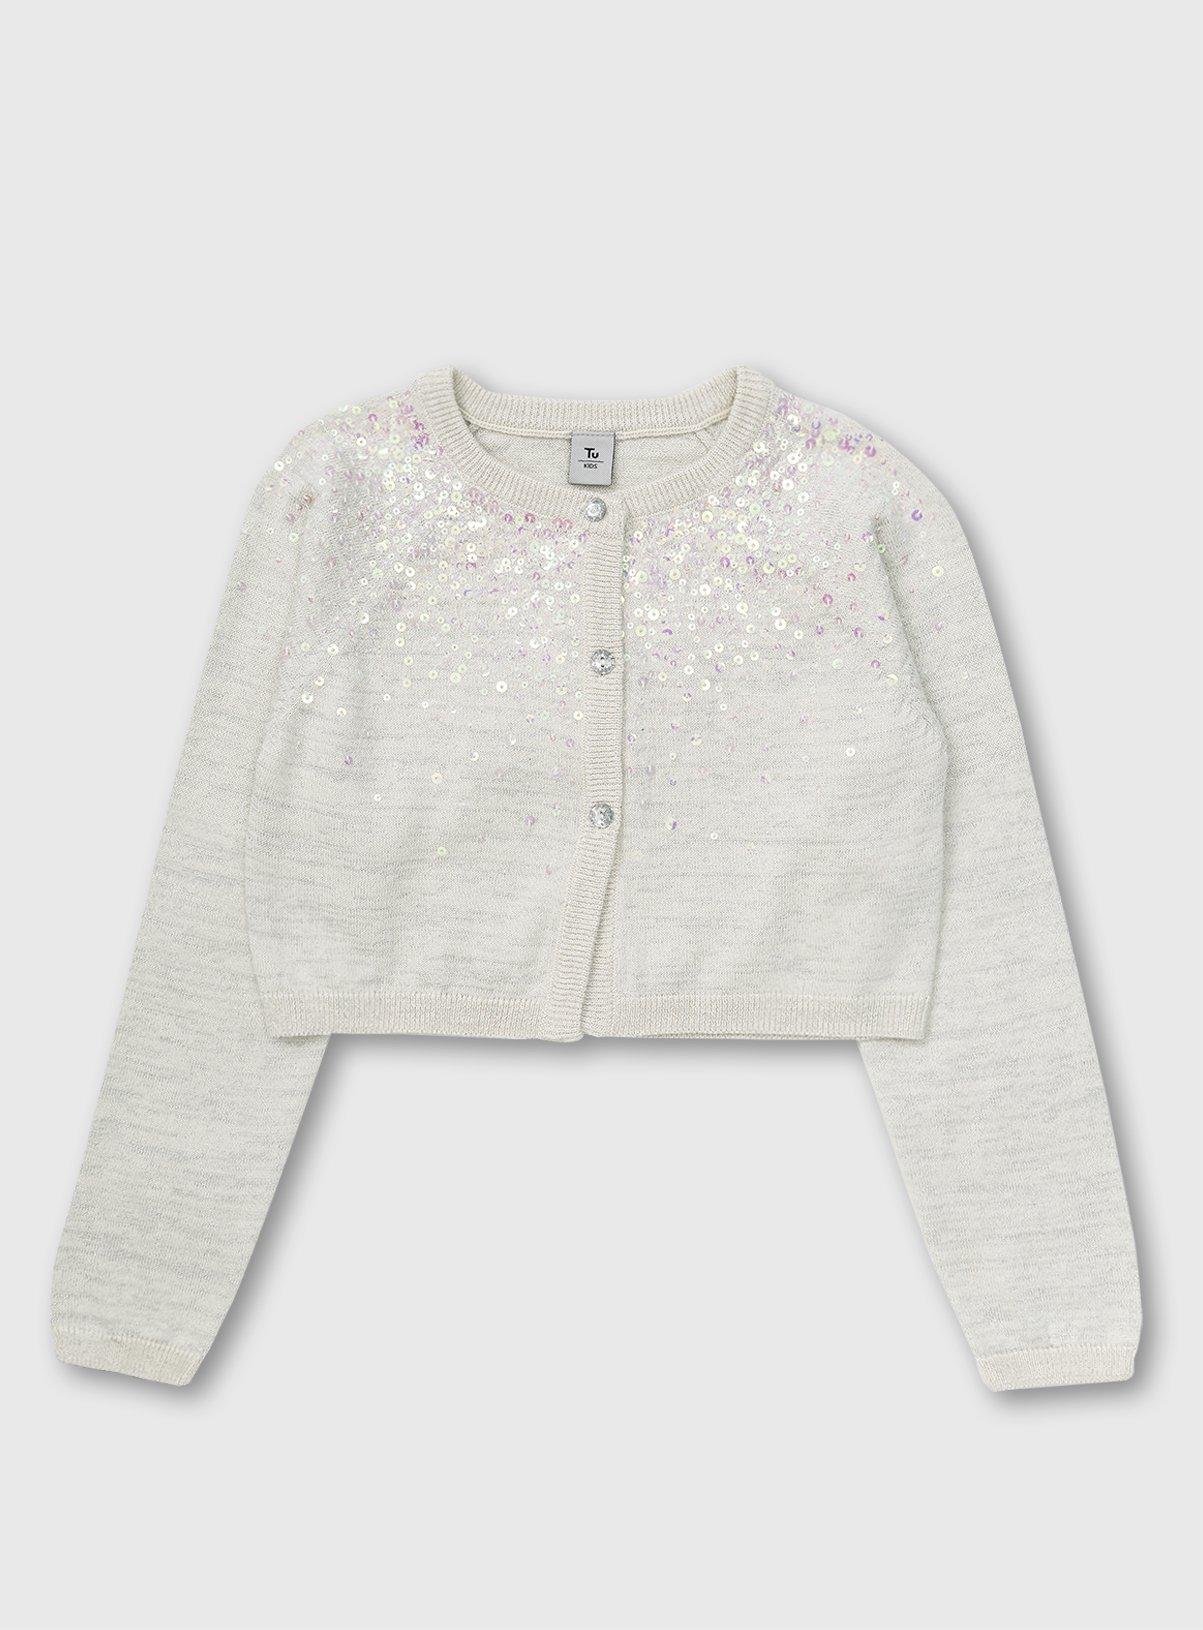 White Glitter Yoke Long Sleeve Bolero - 3 years